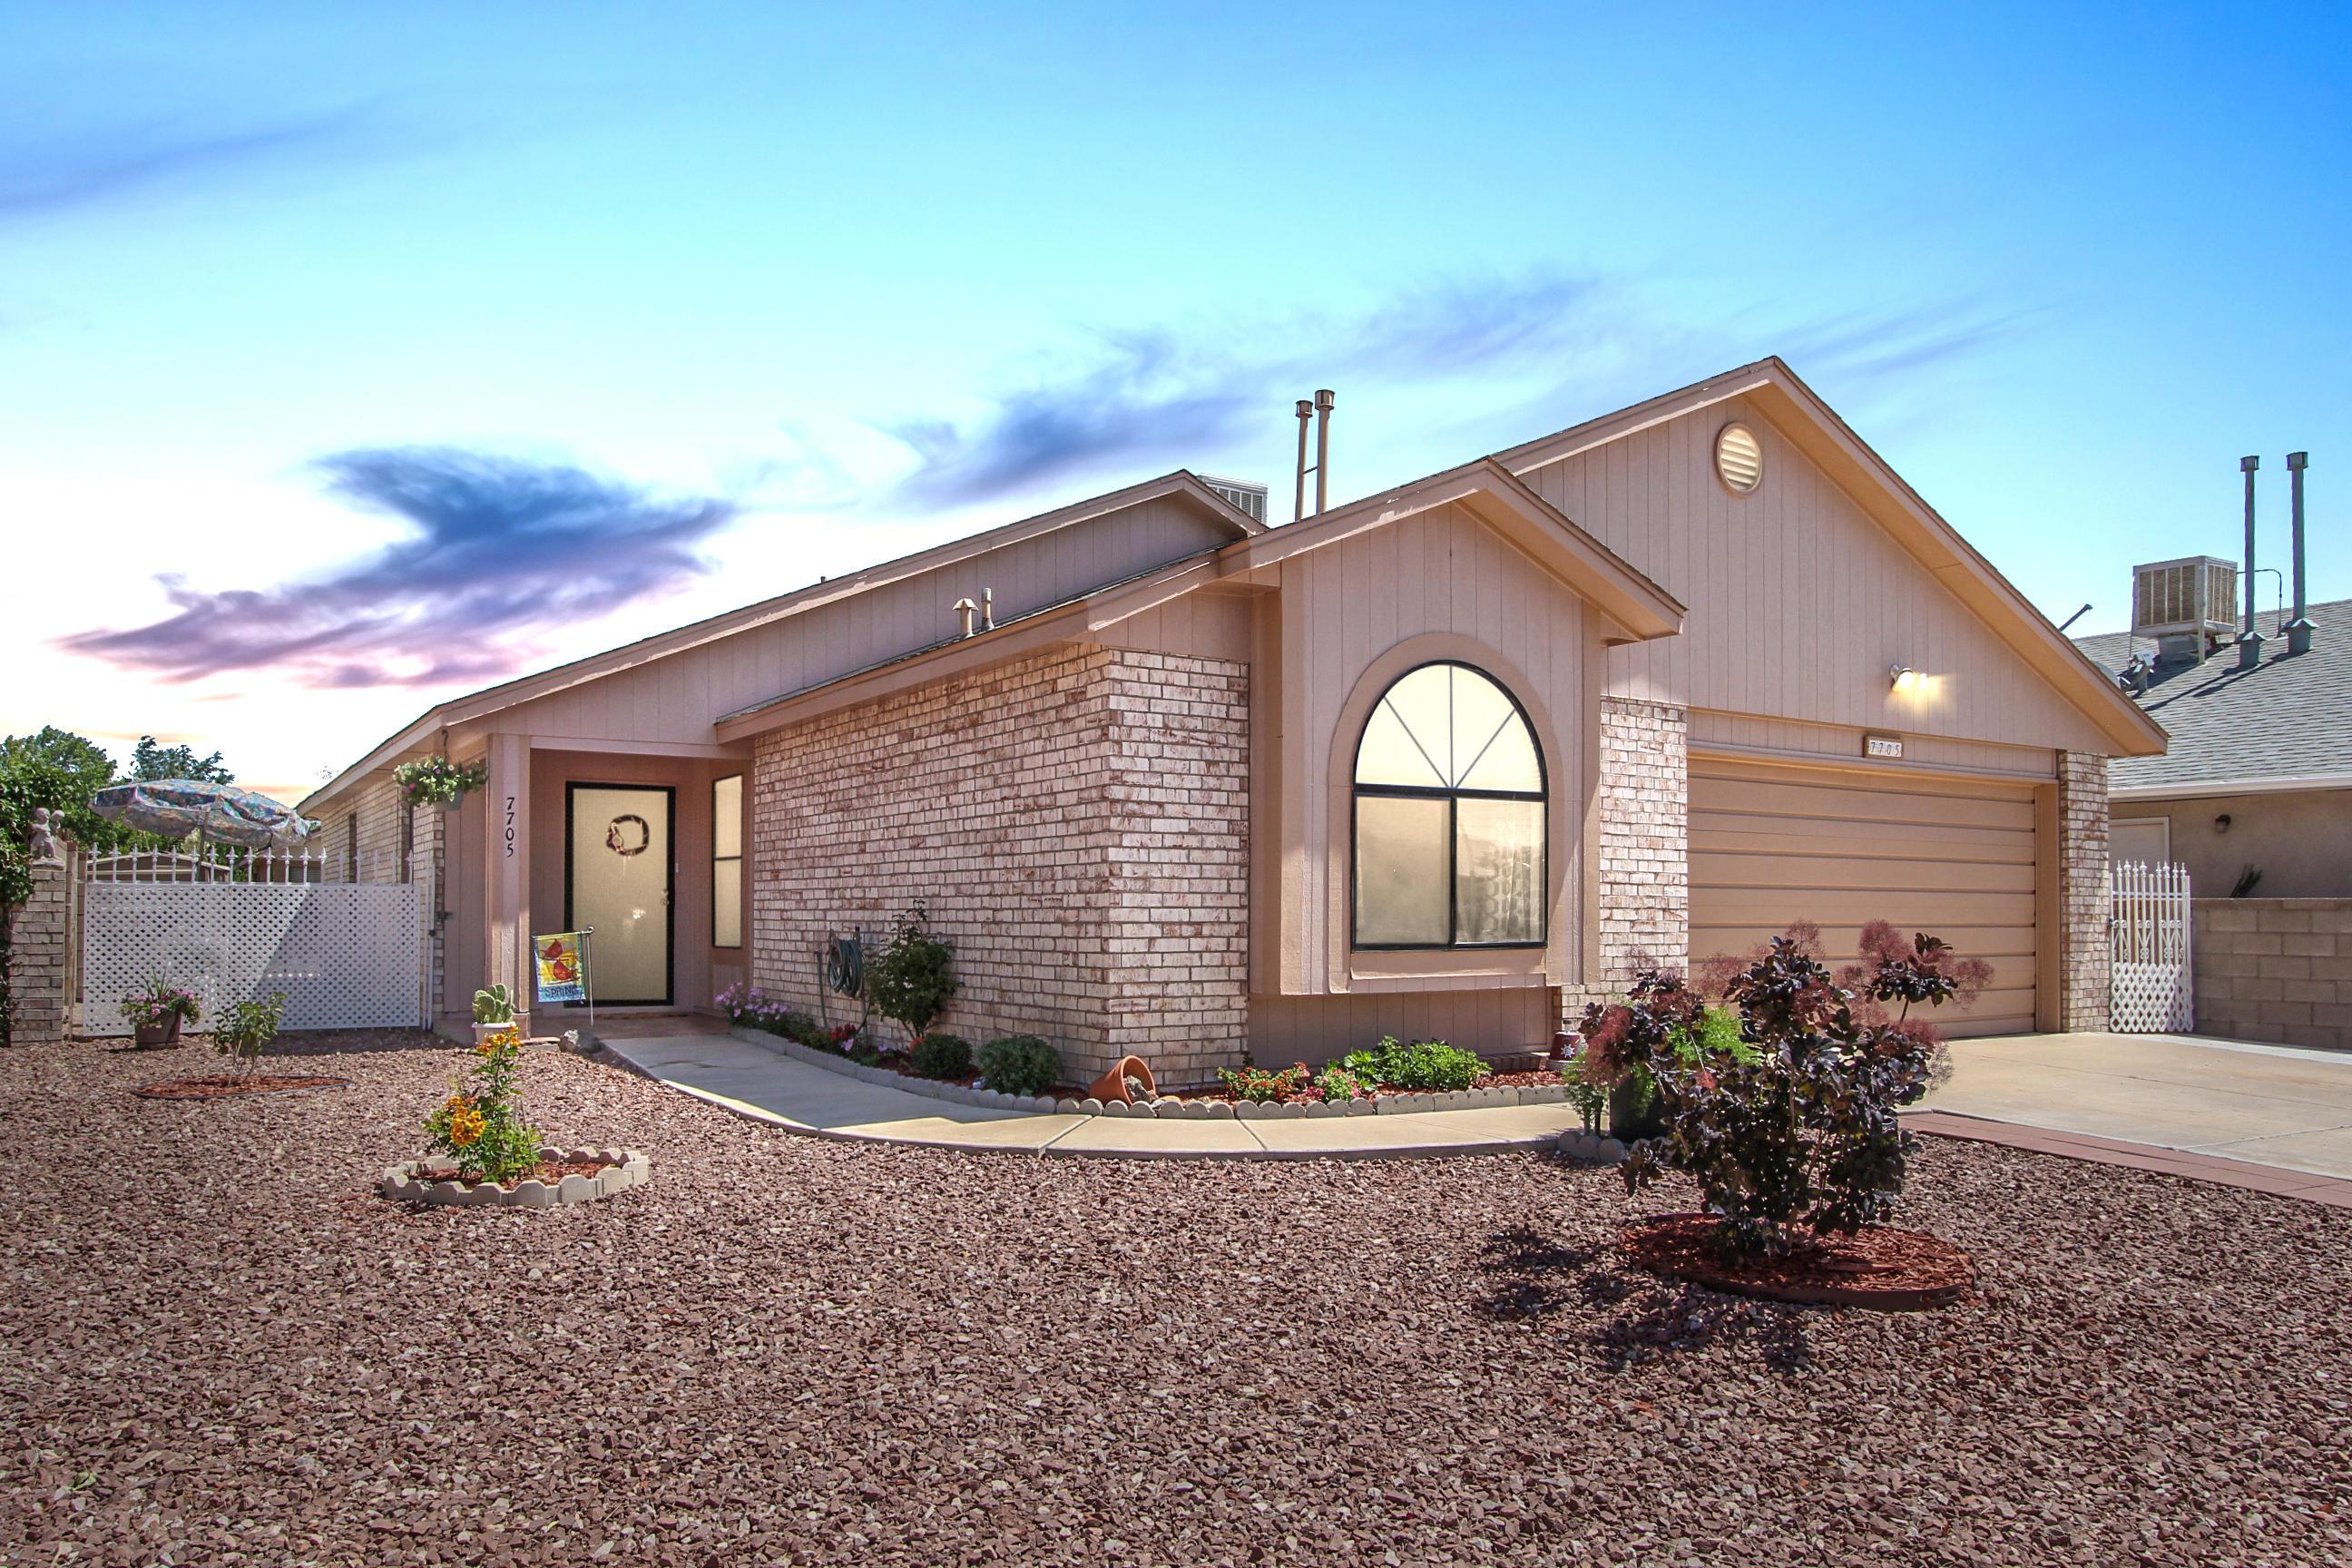 7705 NW Santa Catarina Court, Northwest Albuquerque and Northwest Heights, New Mexico